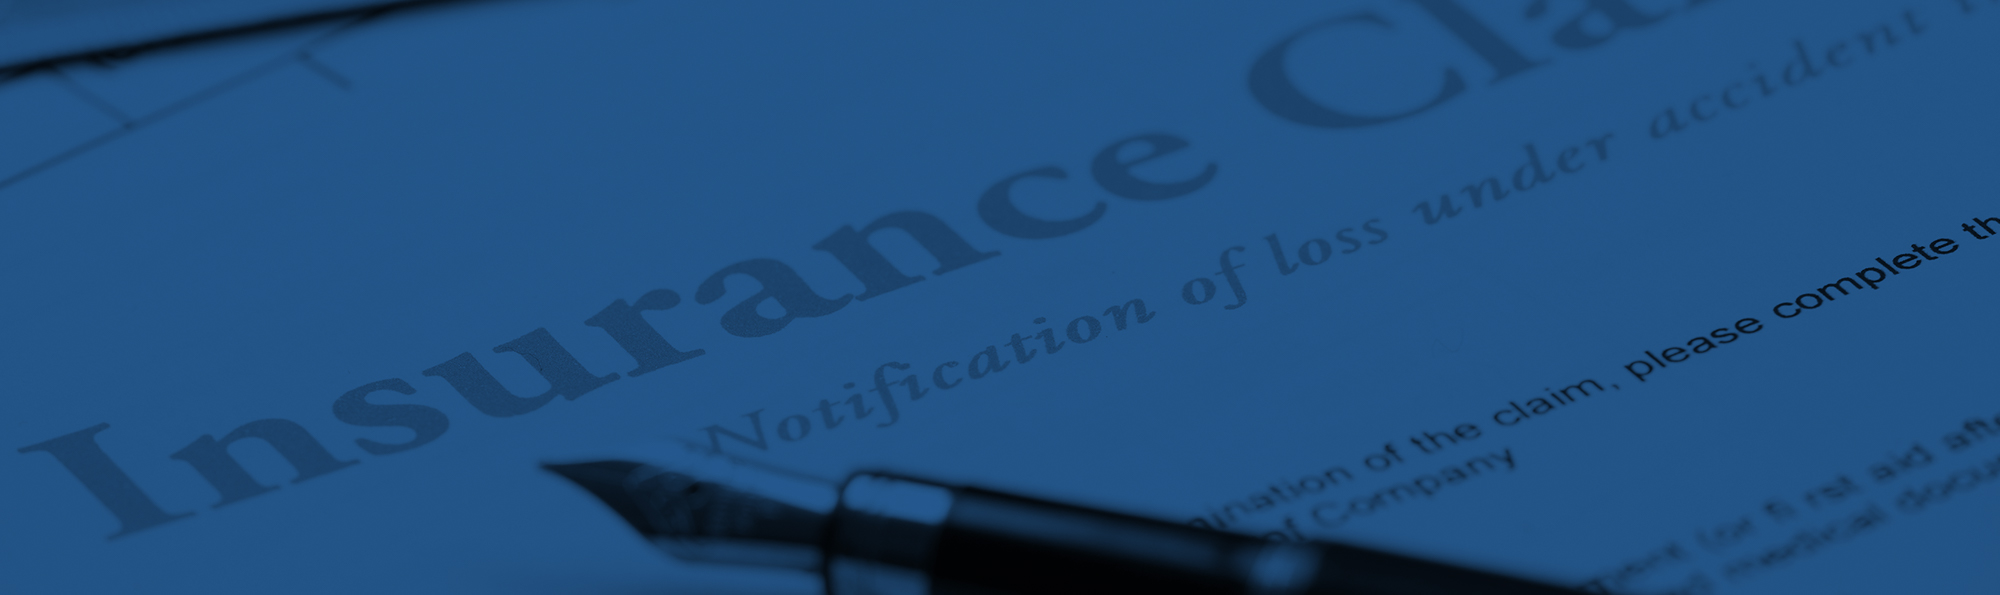 Insurance Law - Thornton, Biechlin, Reynolds & Guerra